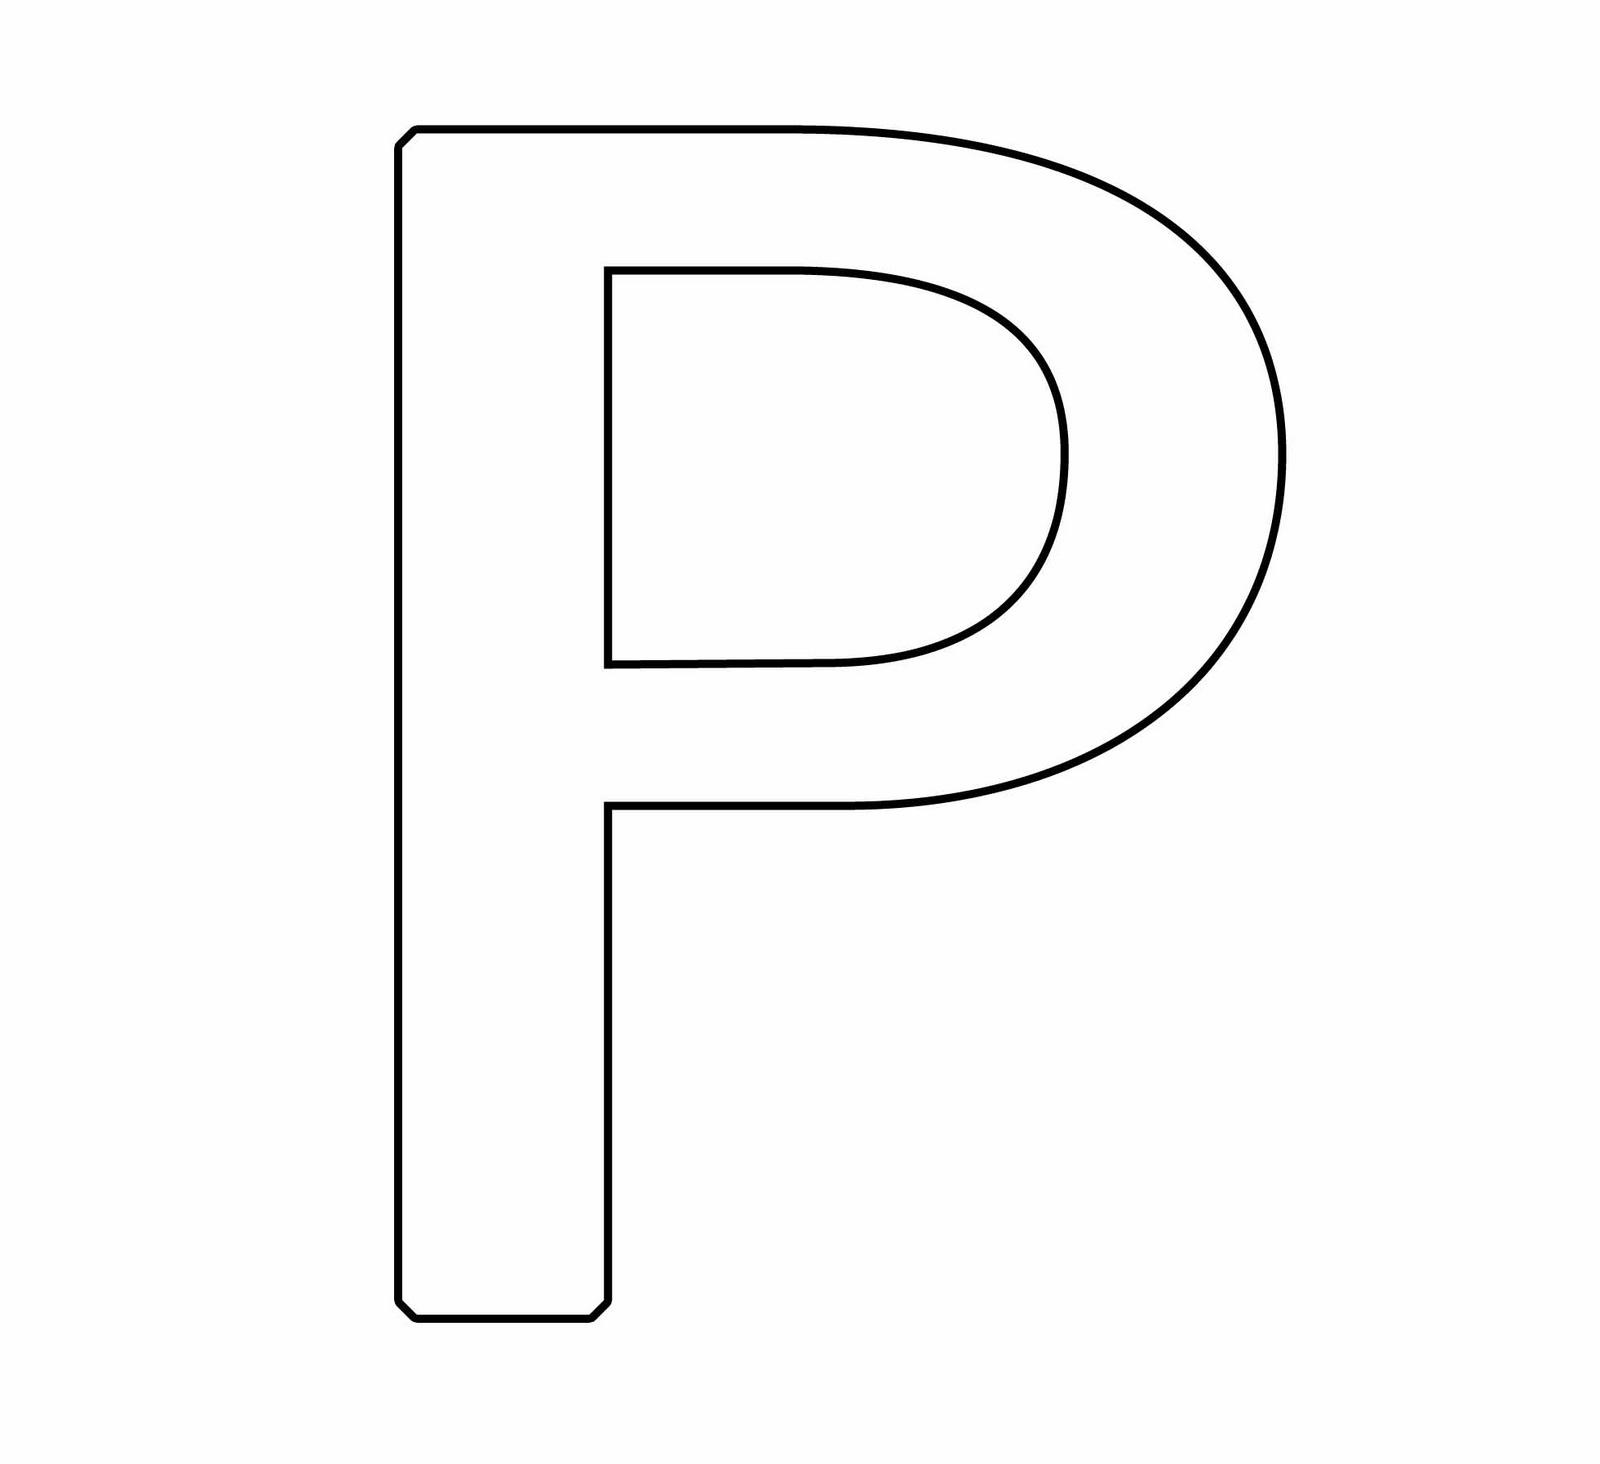 Plantillas De Letras Para Pintar – I Started